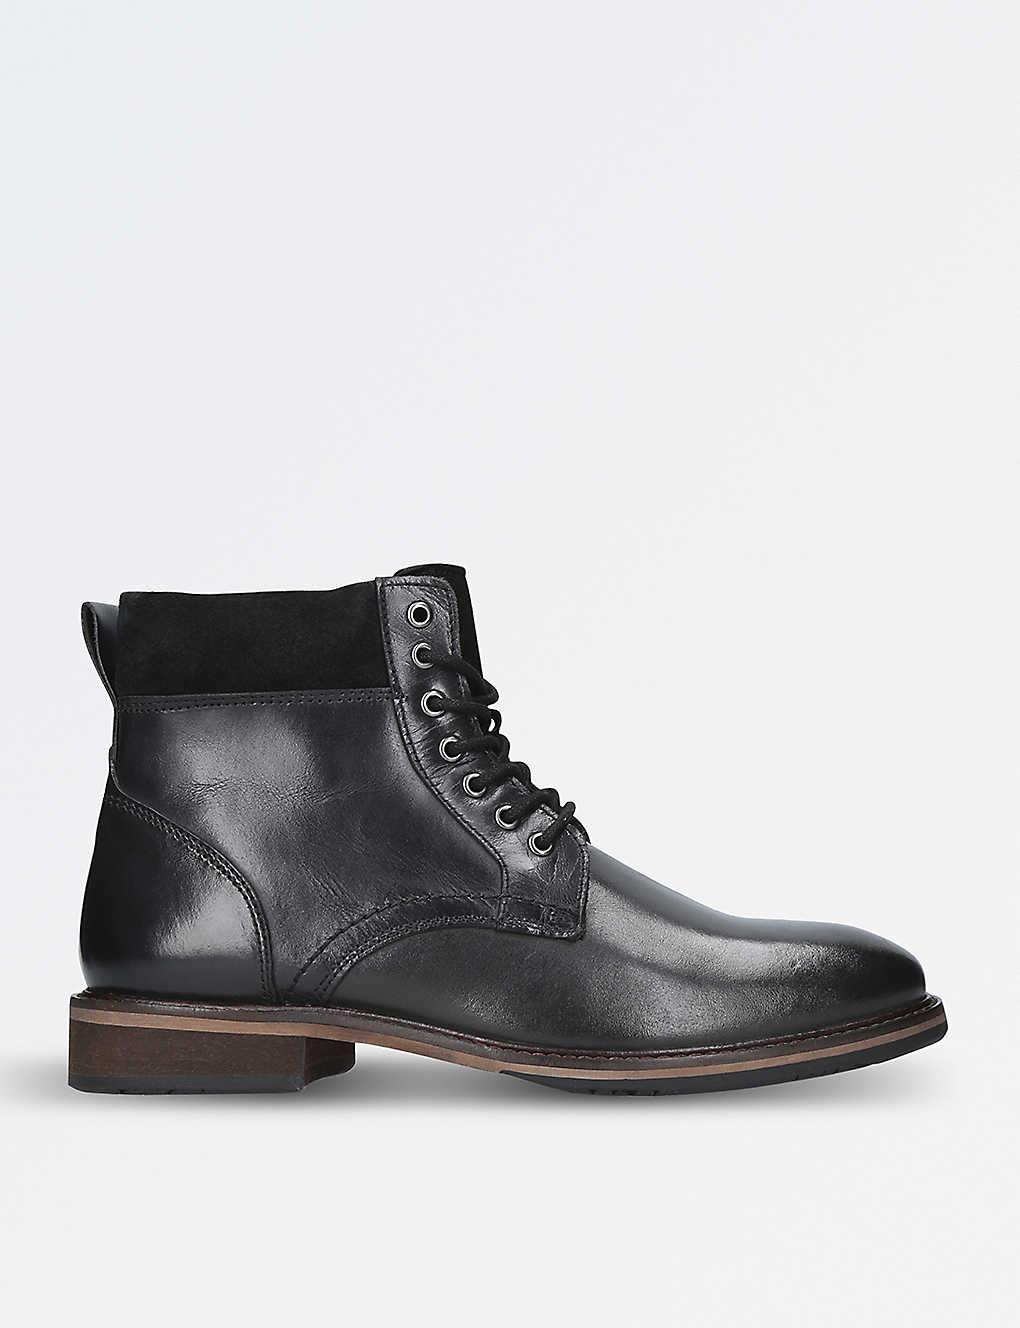 cff8fb1943e KURT GEIGER LONDON - Hogan leather ankle boots | Selfridges.com